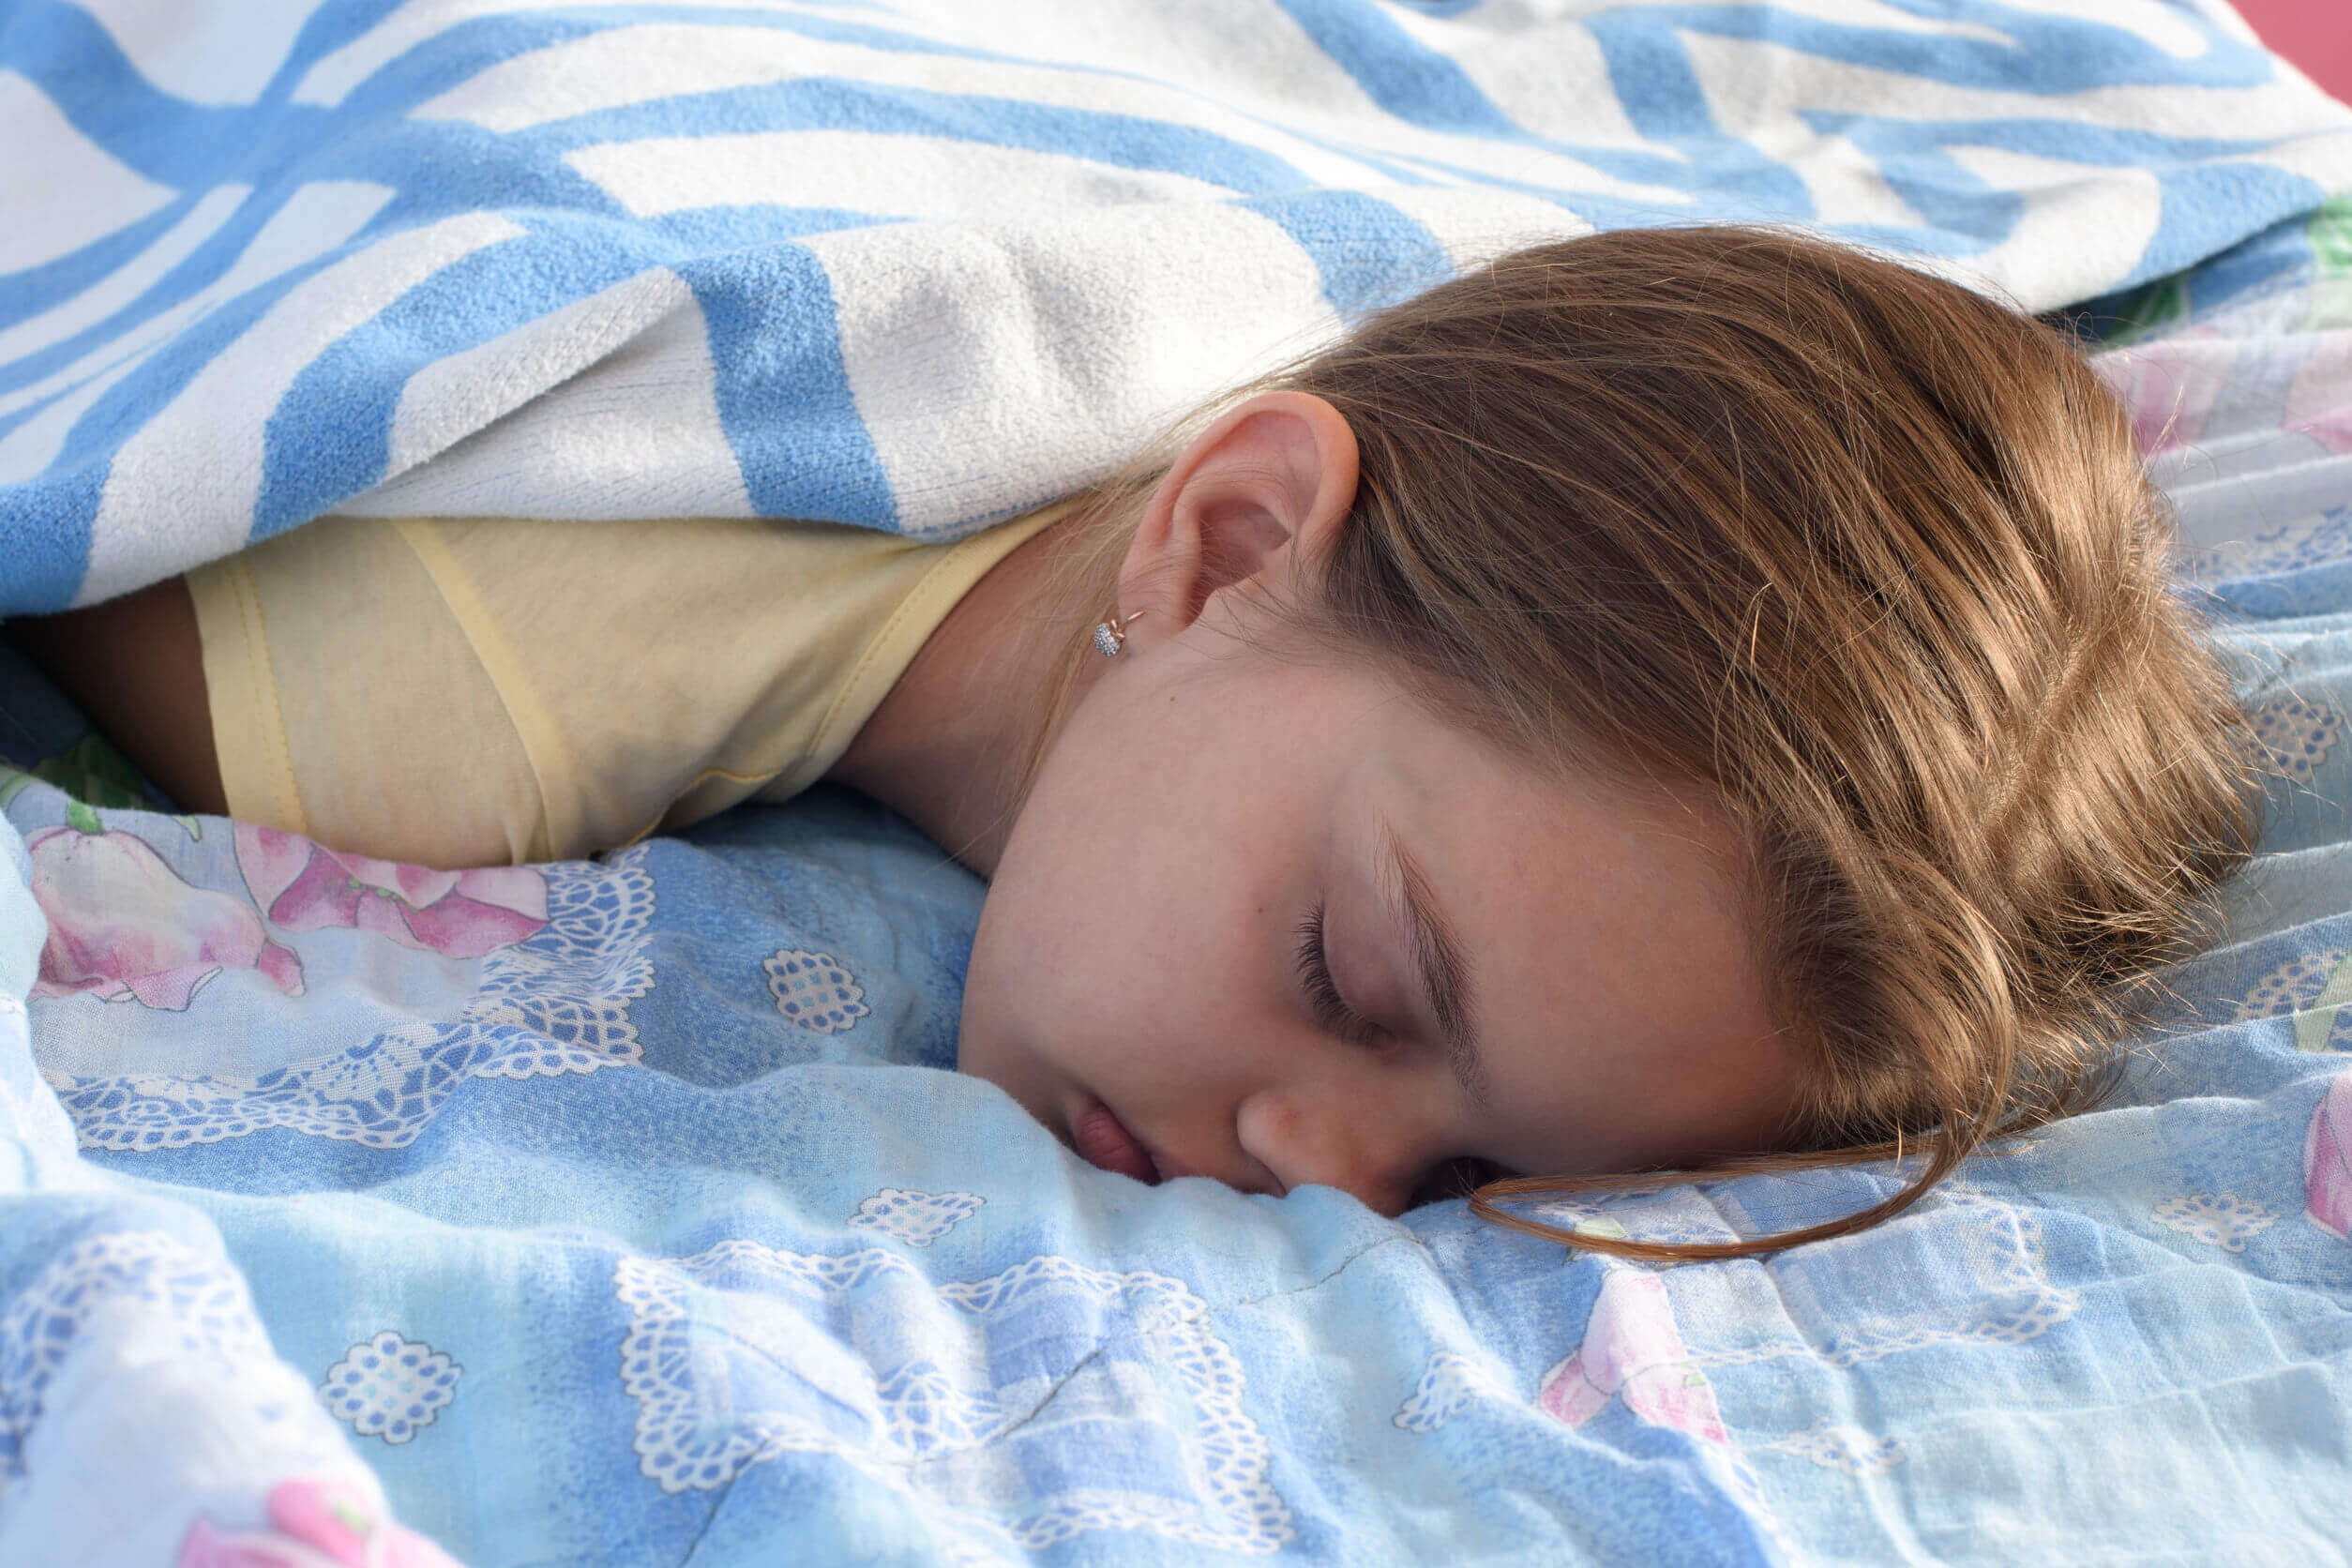 A teenage girl sleeping facedown on her bed.